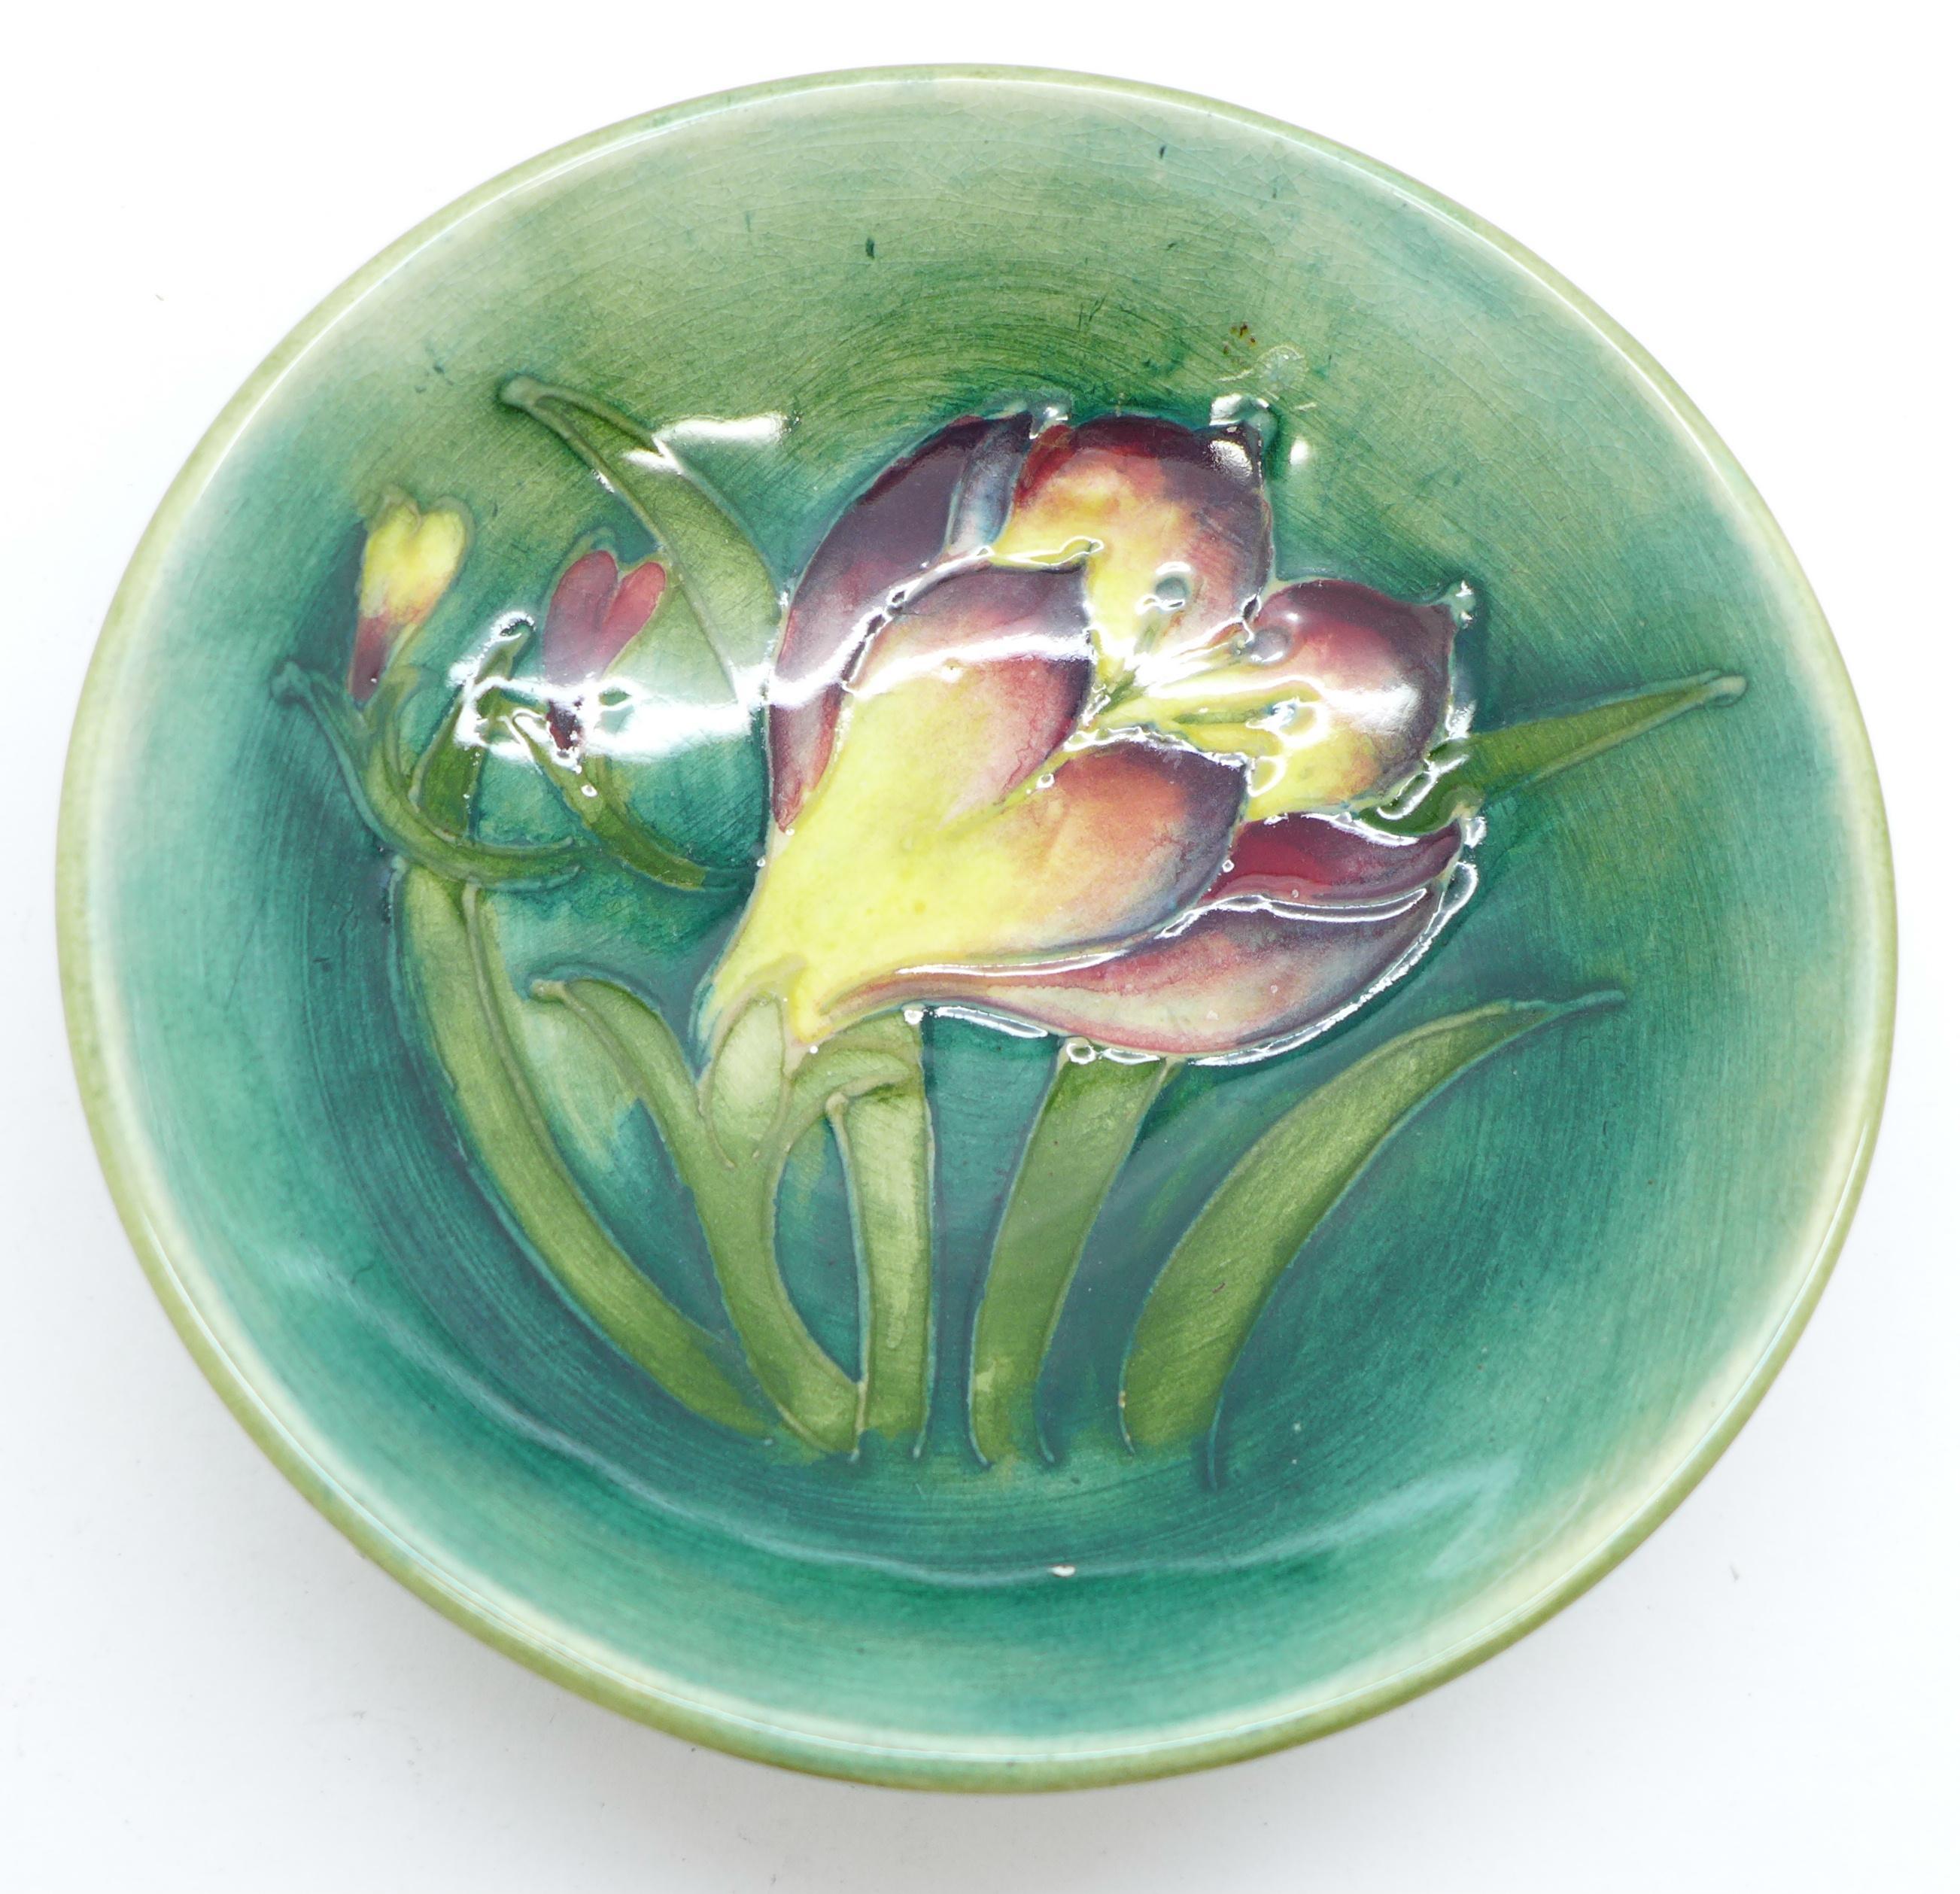 A Moorcroft freesia dish, 108mm diameter - Image 2 of 3